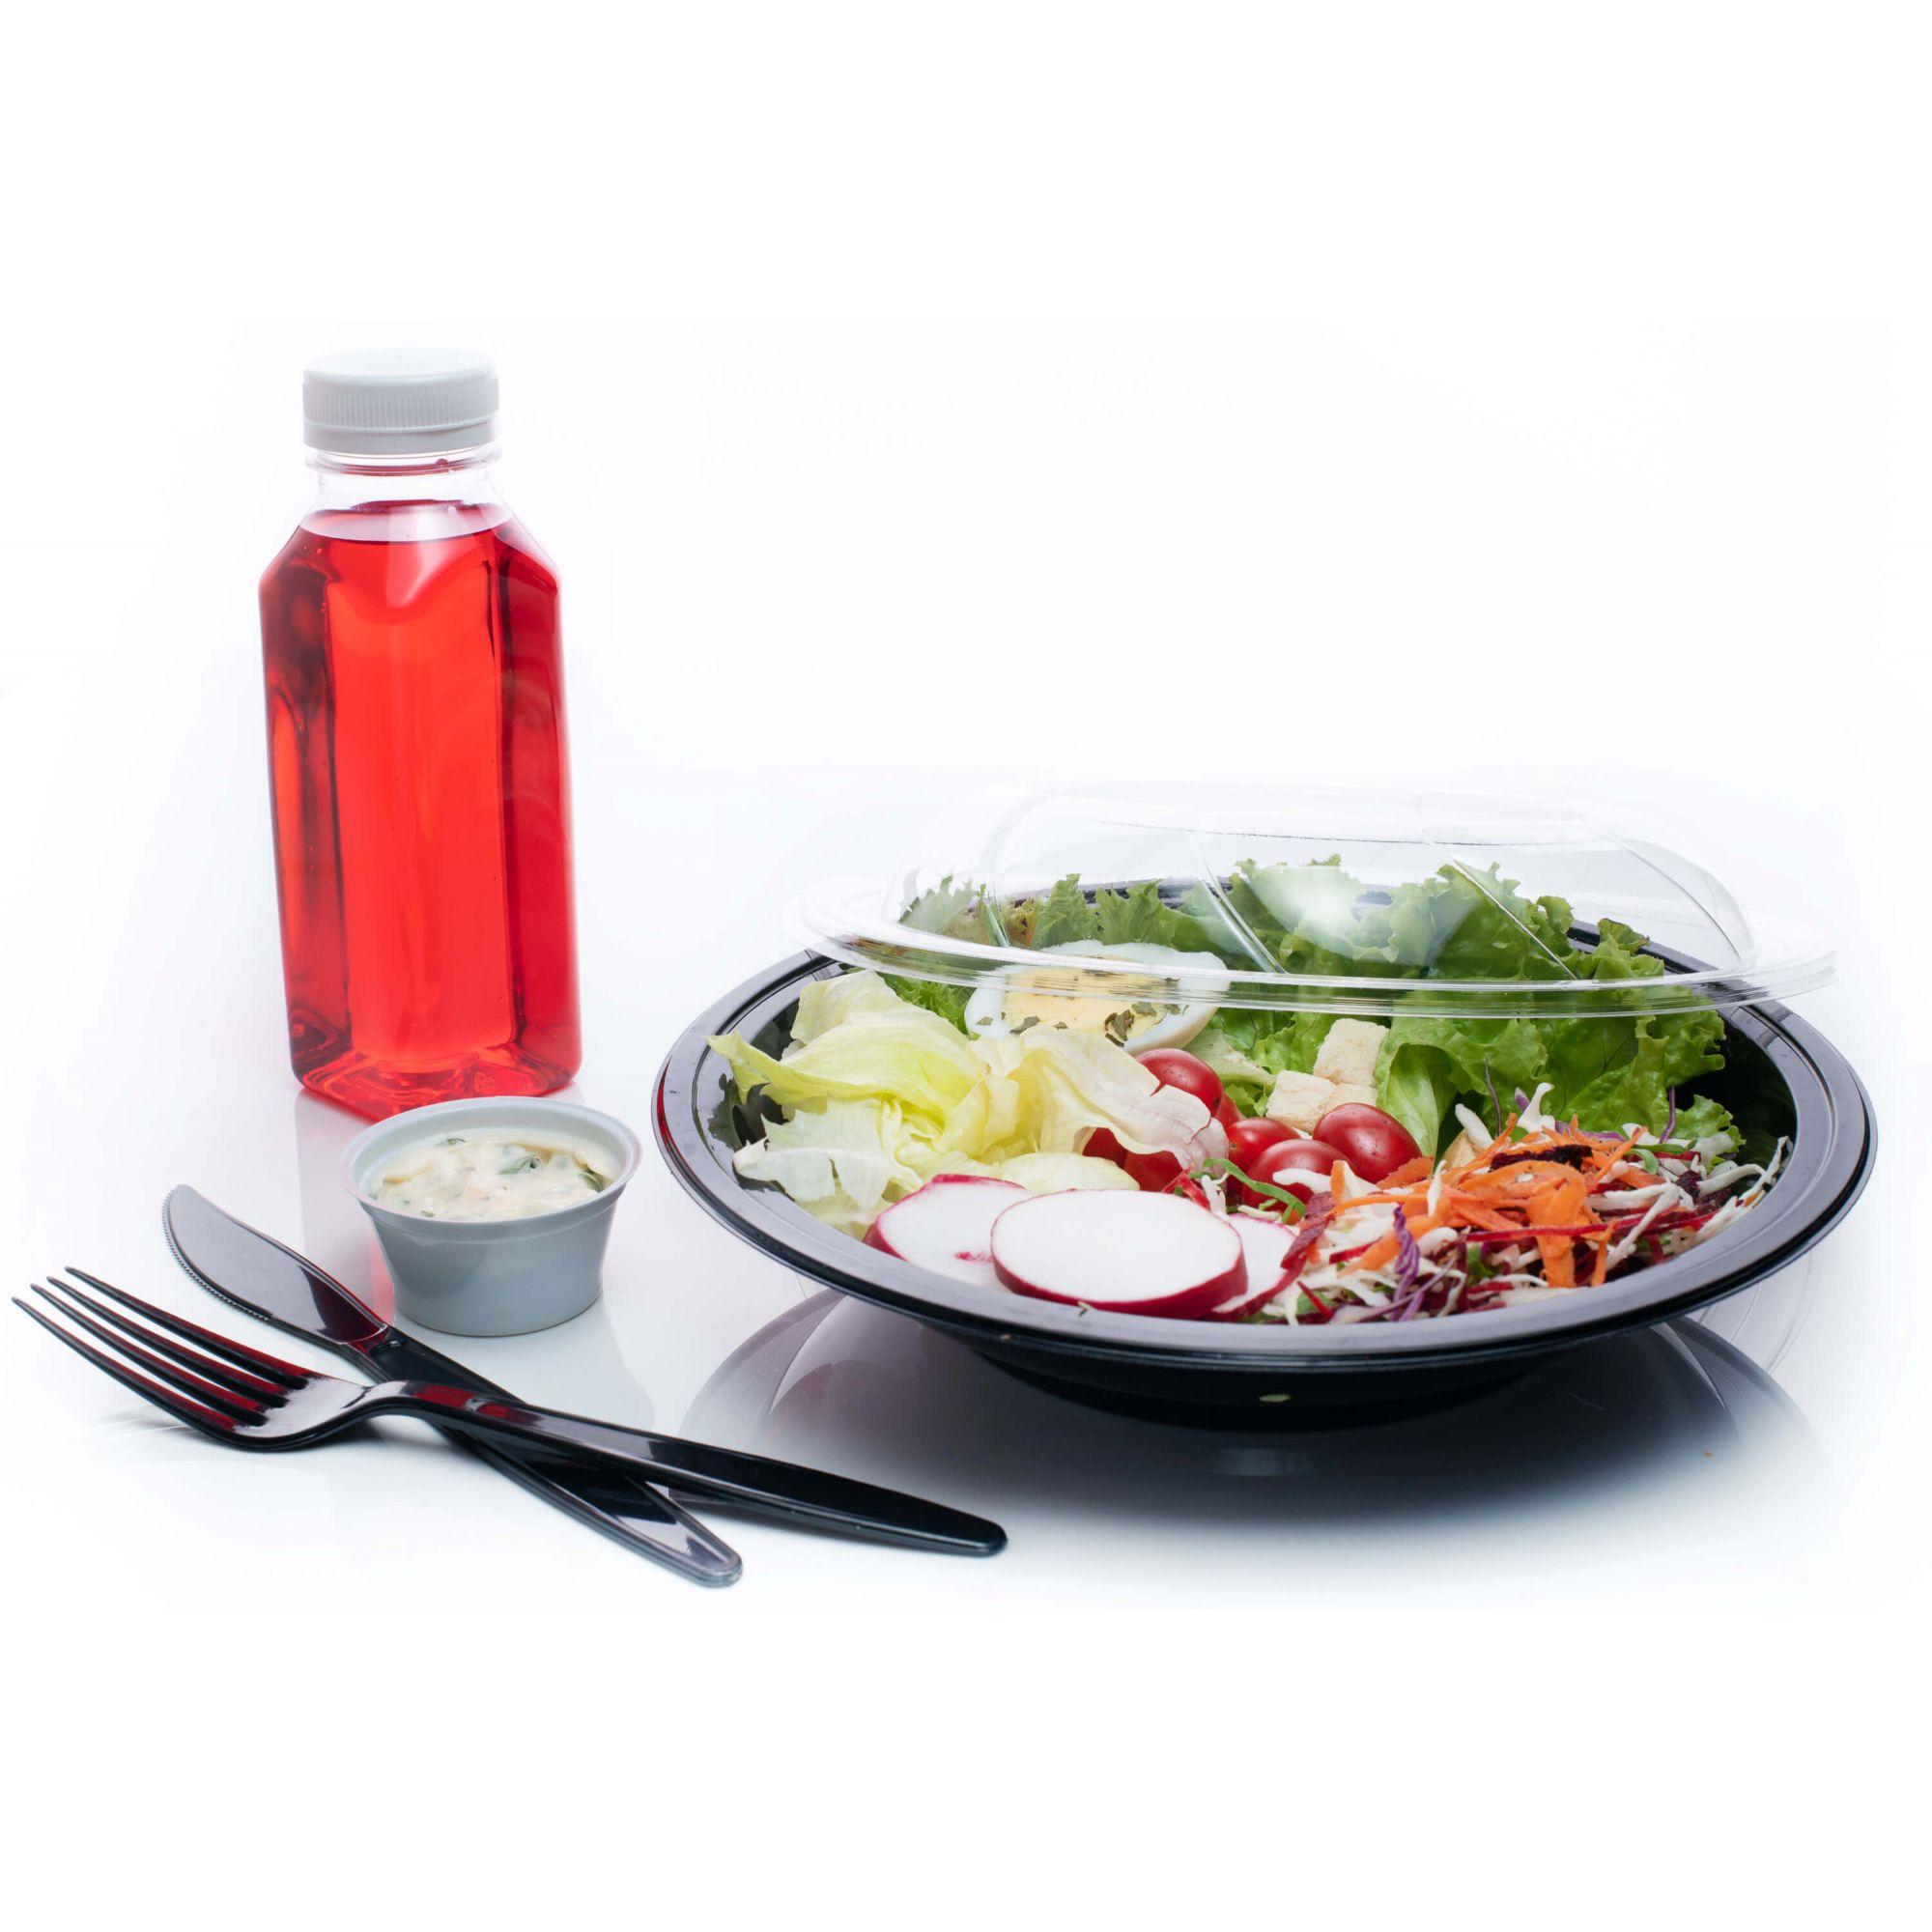 Embalagem para delivery Salada  - Galvanotek G 25i G 26i